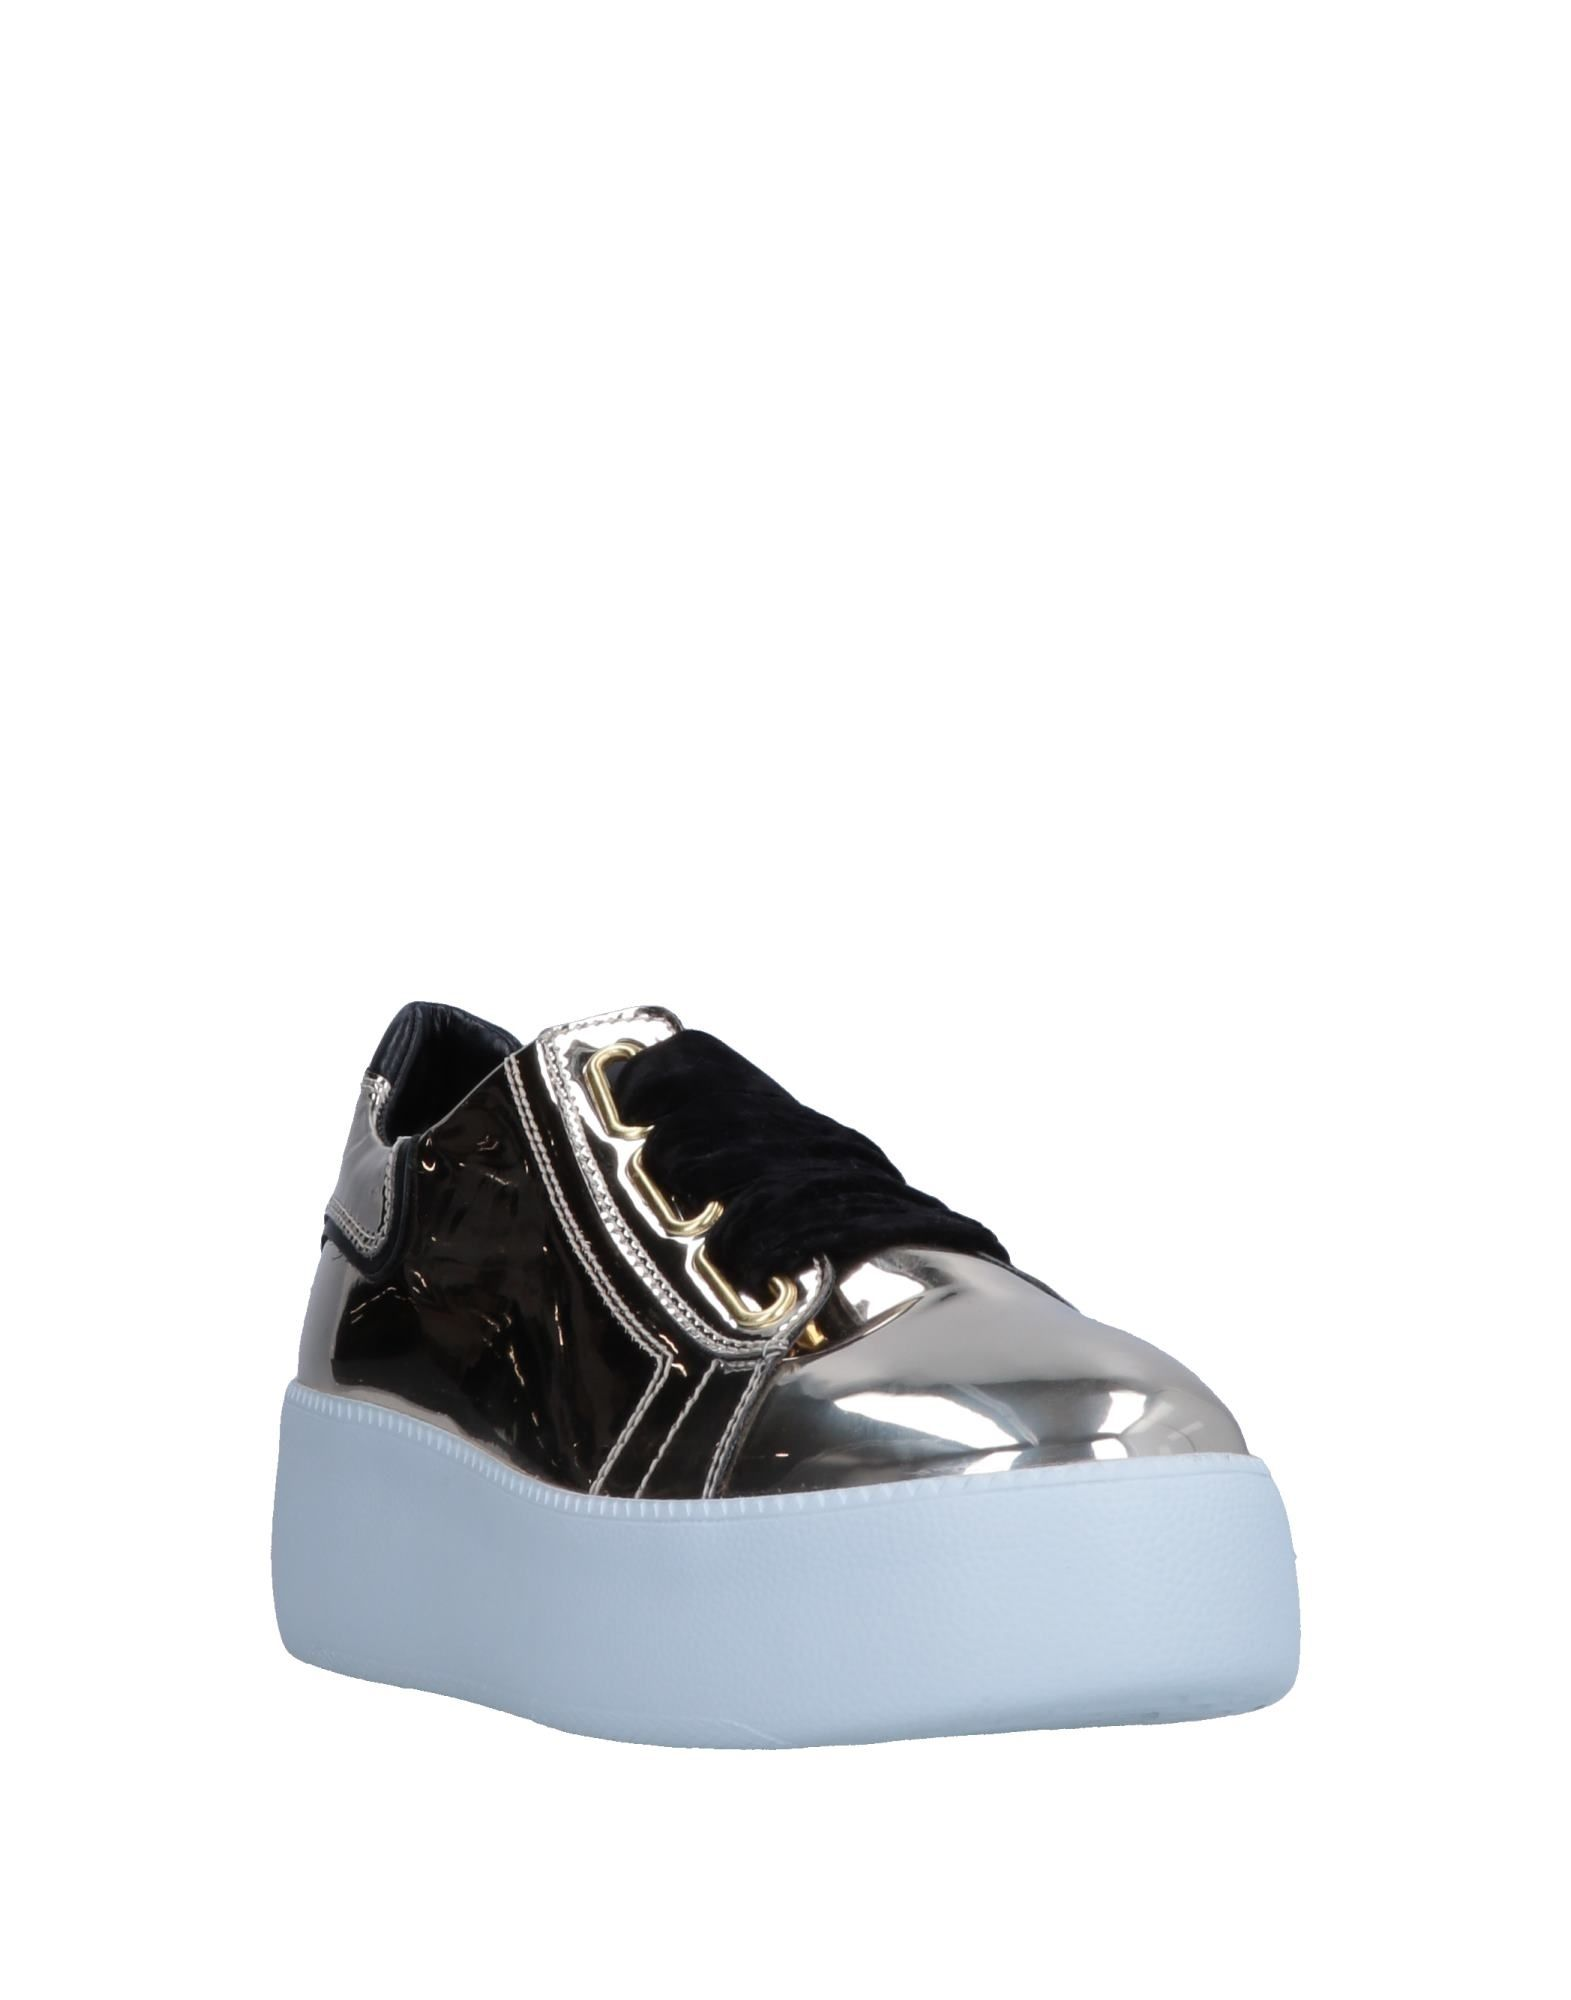 Just Another Copy Qualität Turnschuhes Damen 11557533TX Gute Qualität Copy beliebte Schuhe c3eea1